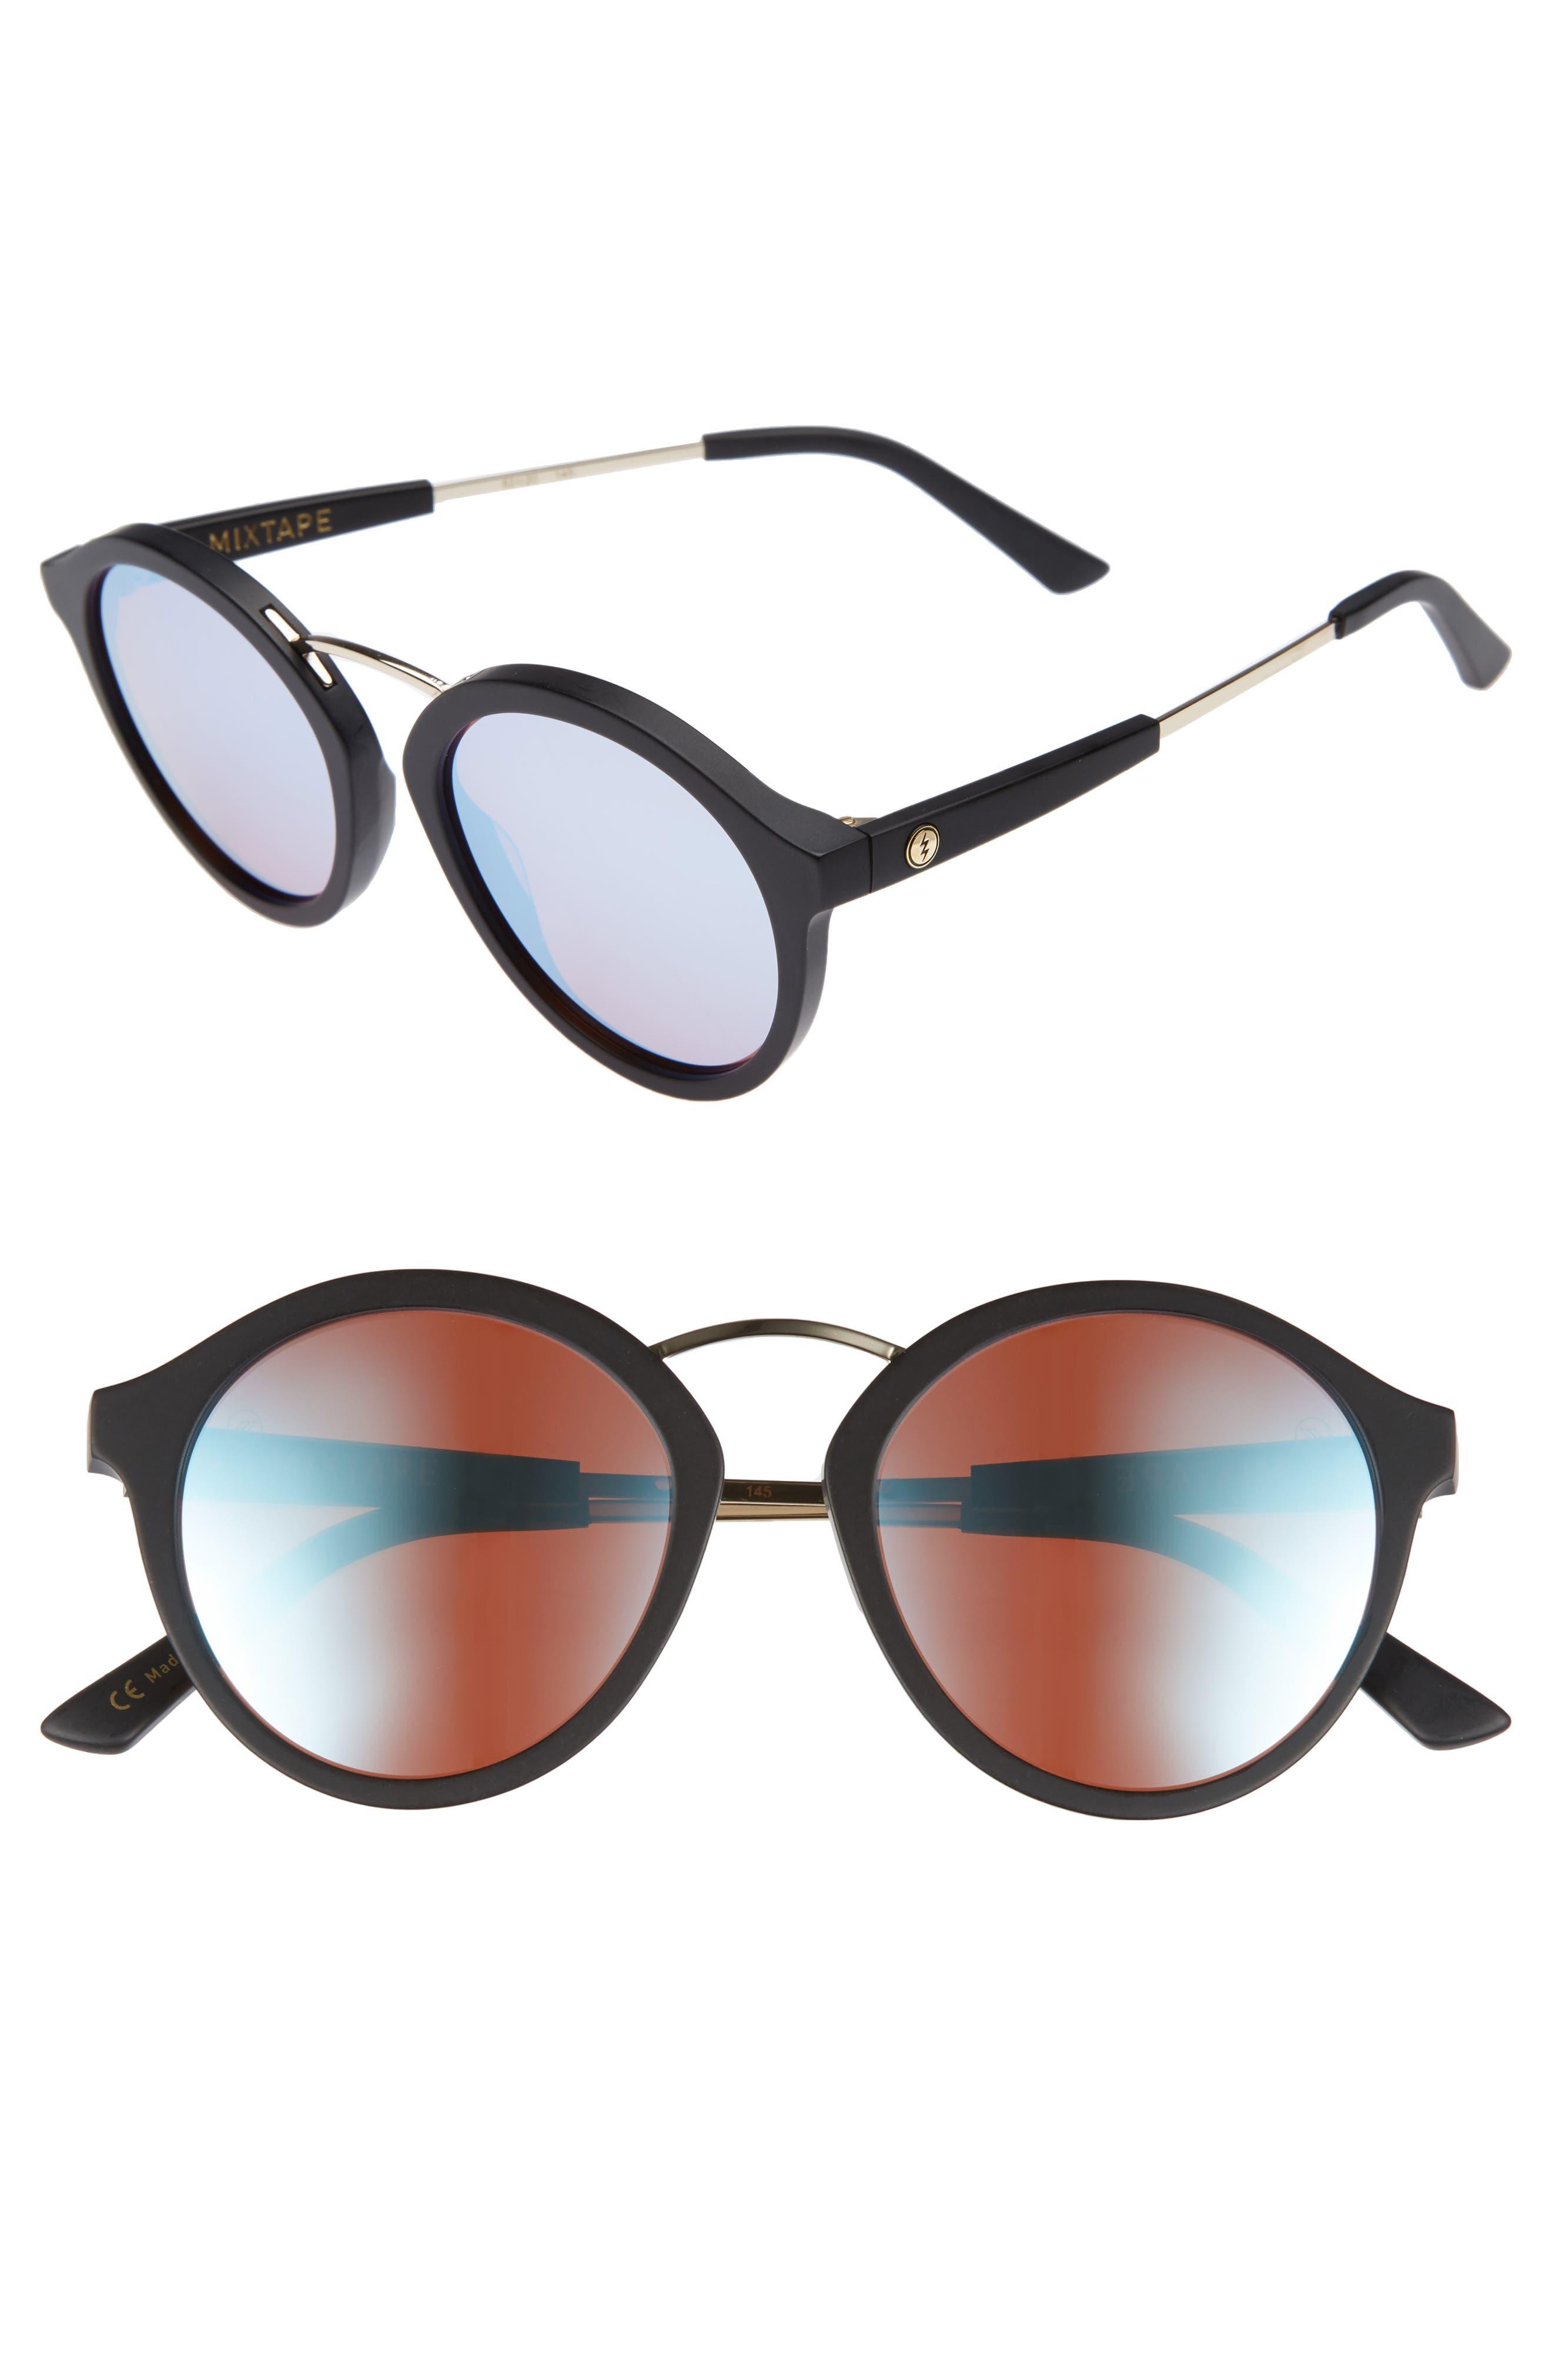 Main Image - ELECTRIC Mix Tape 52mm Mirrored Round Sunglasses